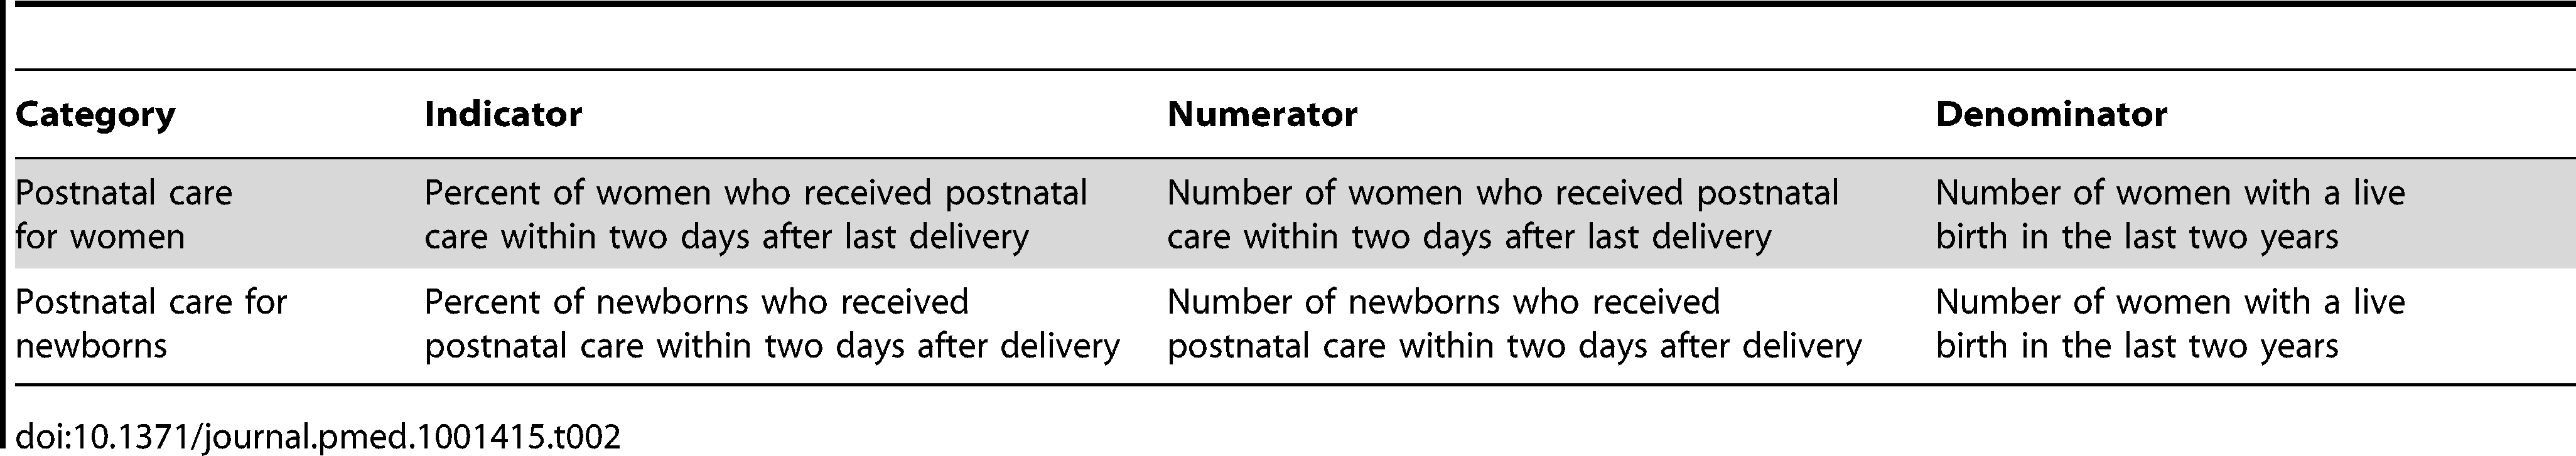 Global indicators for postnatal care coverage, 2010.